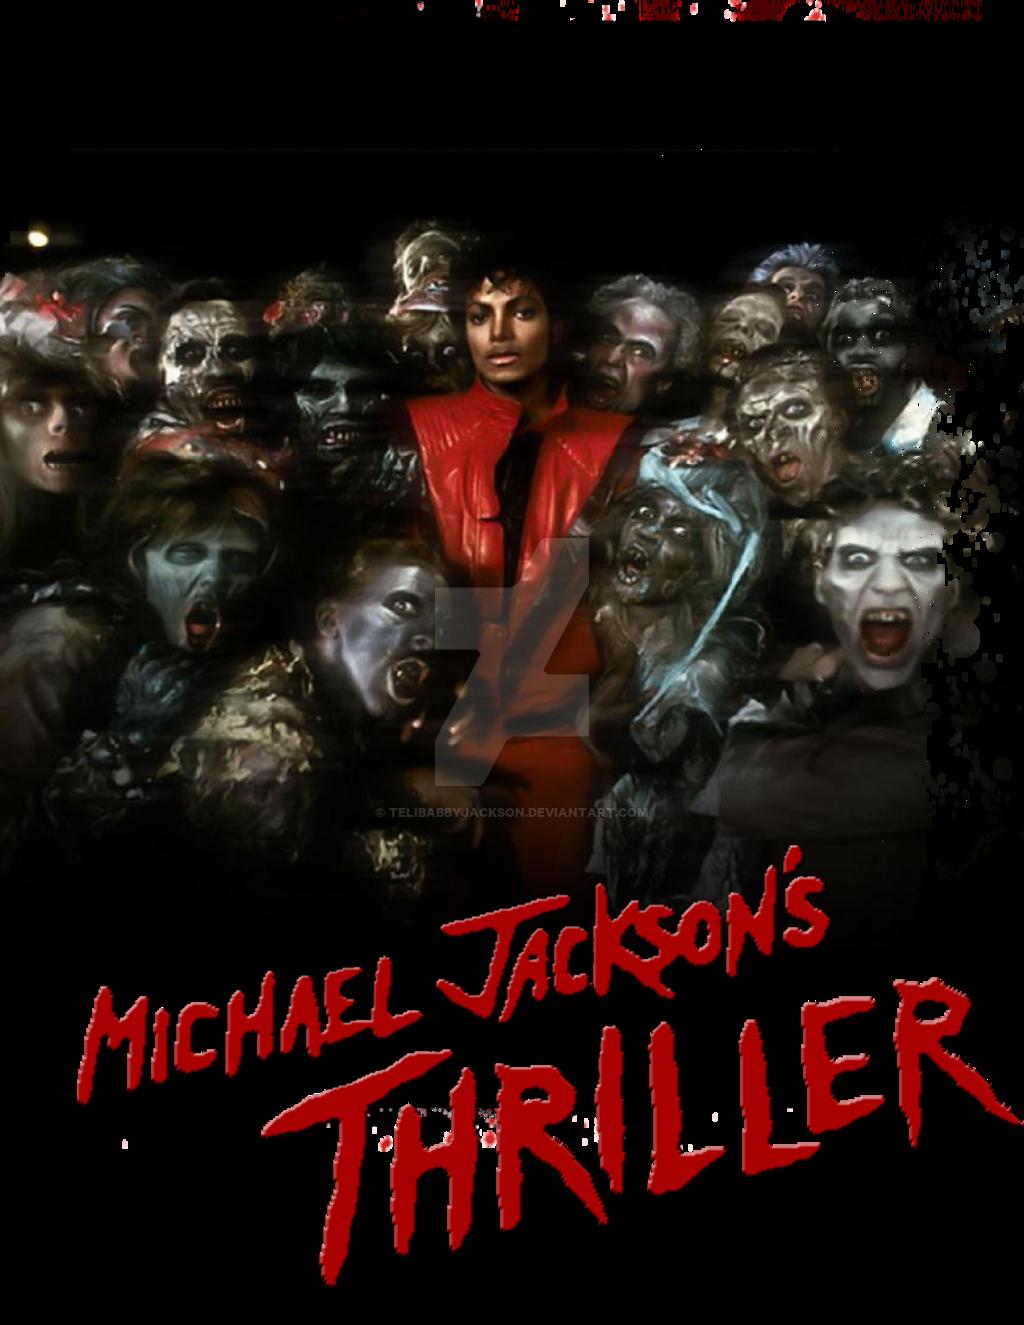 Michael Jackson Thriller Google Search Michael Jackson Thriller Michael Jackson Poster Michael Jackson Wallpaper